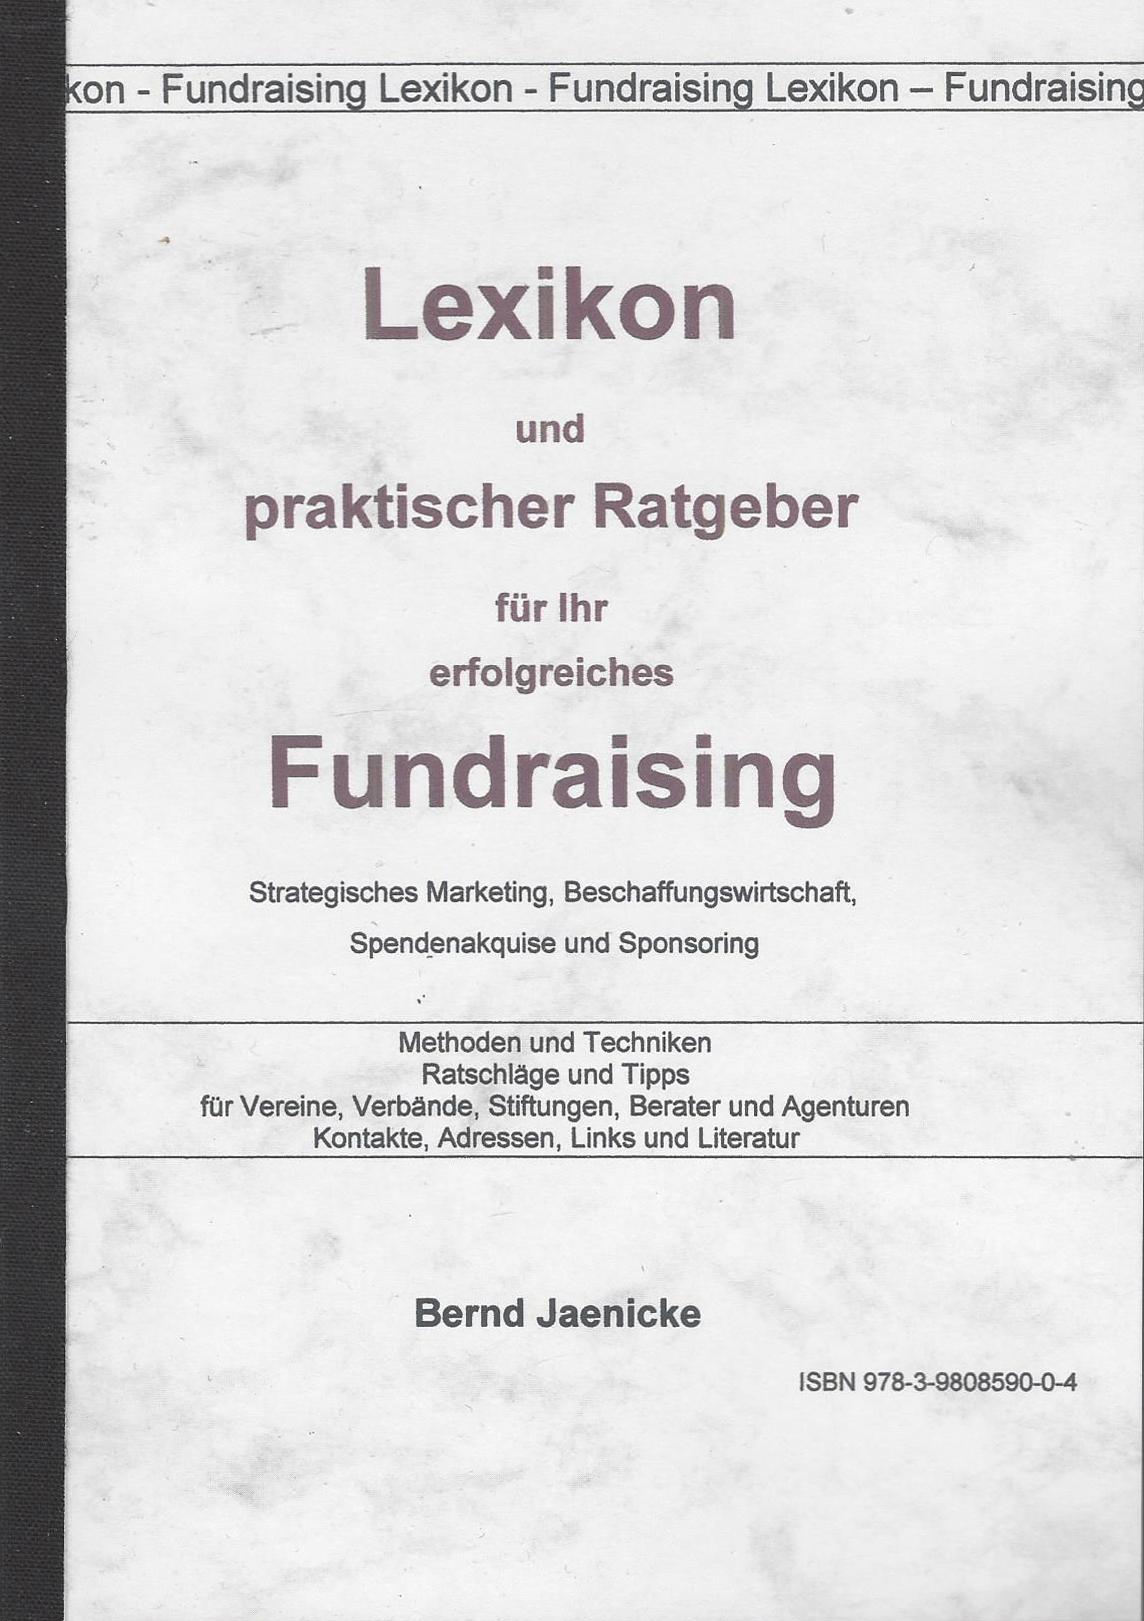 Fundraisinglexikon, Bernd Jaenicke